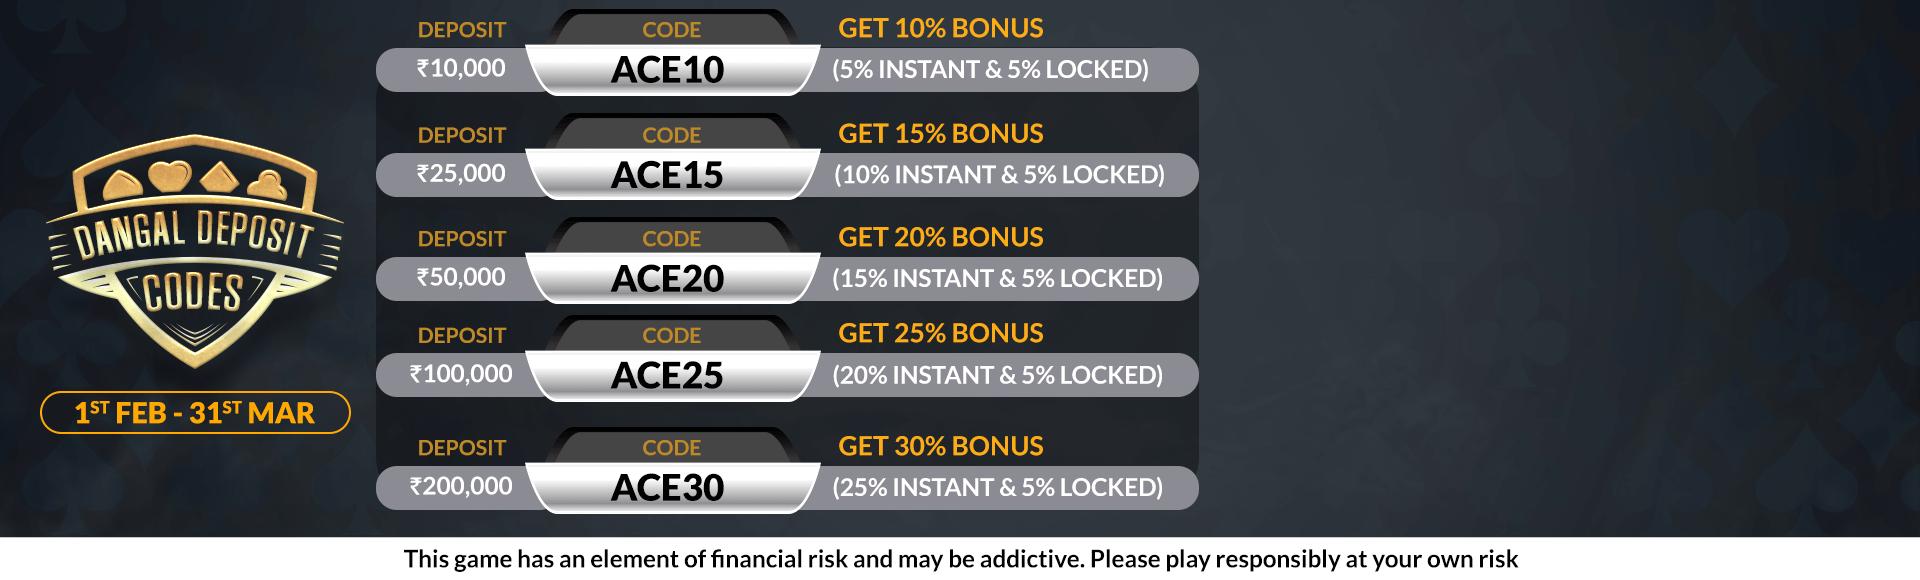 Online Poker Play Poker Online Games In India At Pokerdangal